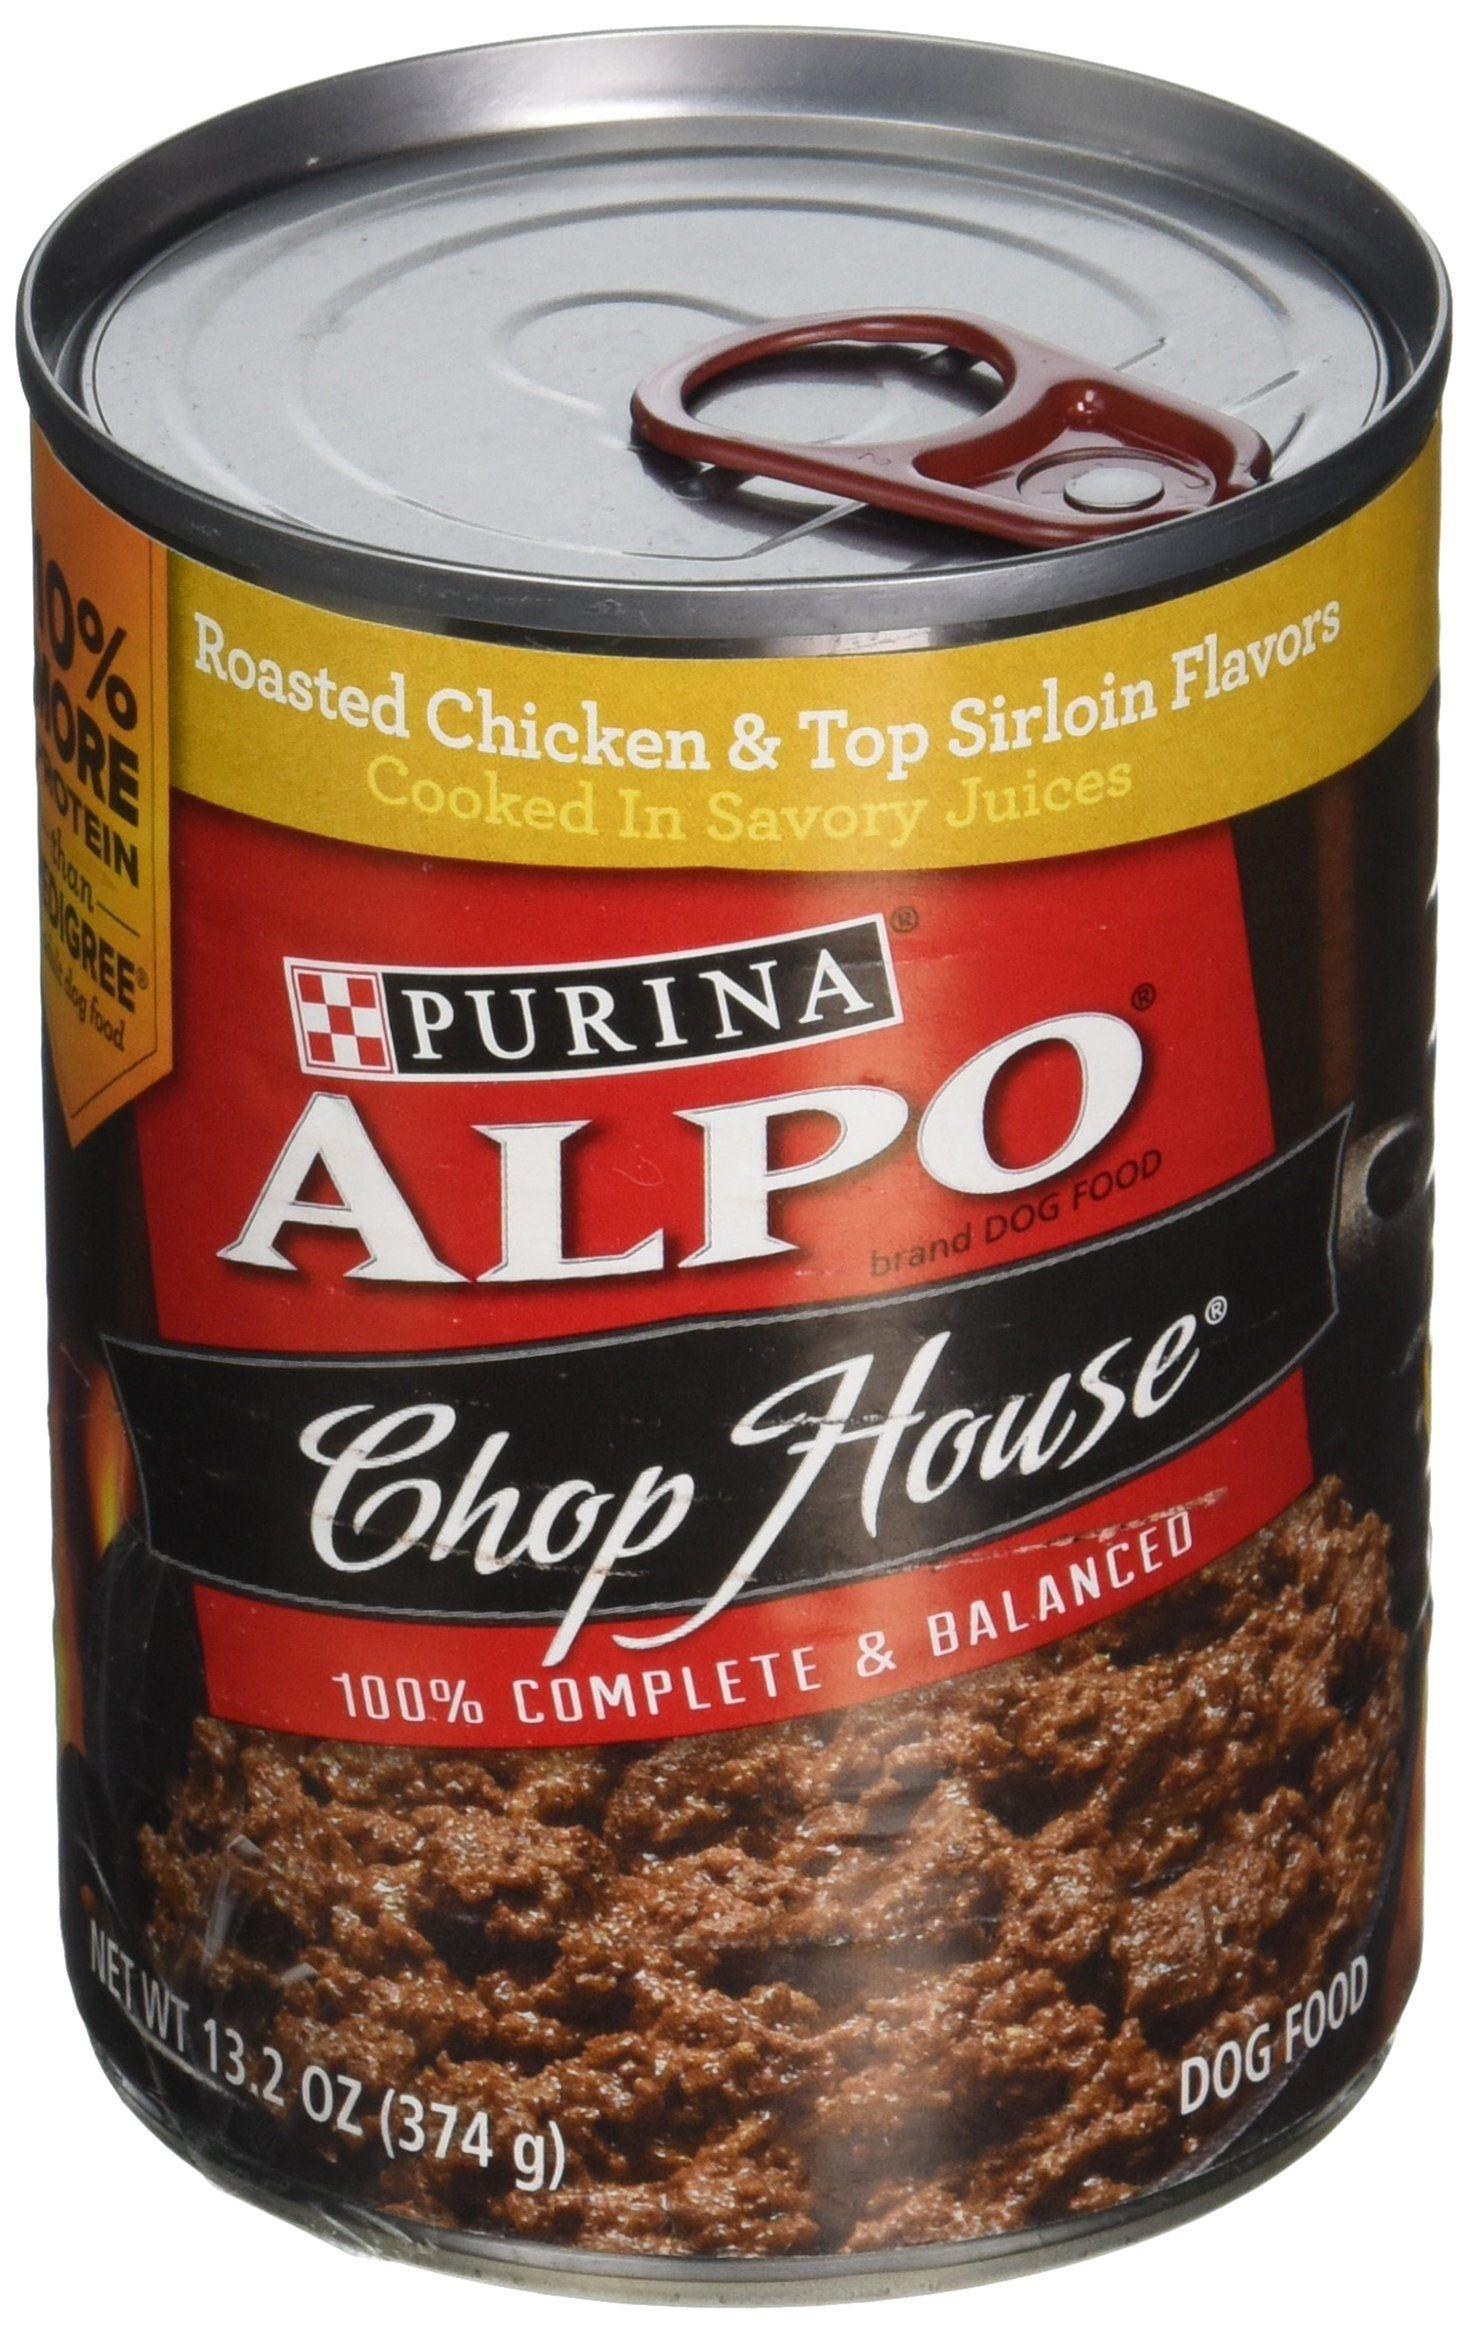 Alpo chop house roasted chicken flavor dog food 132 oz